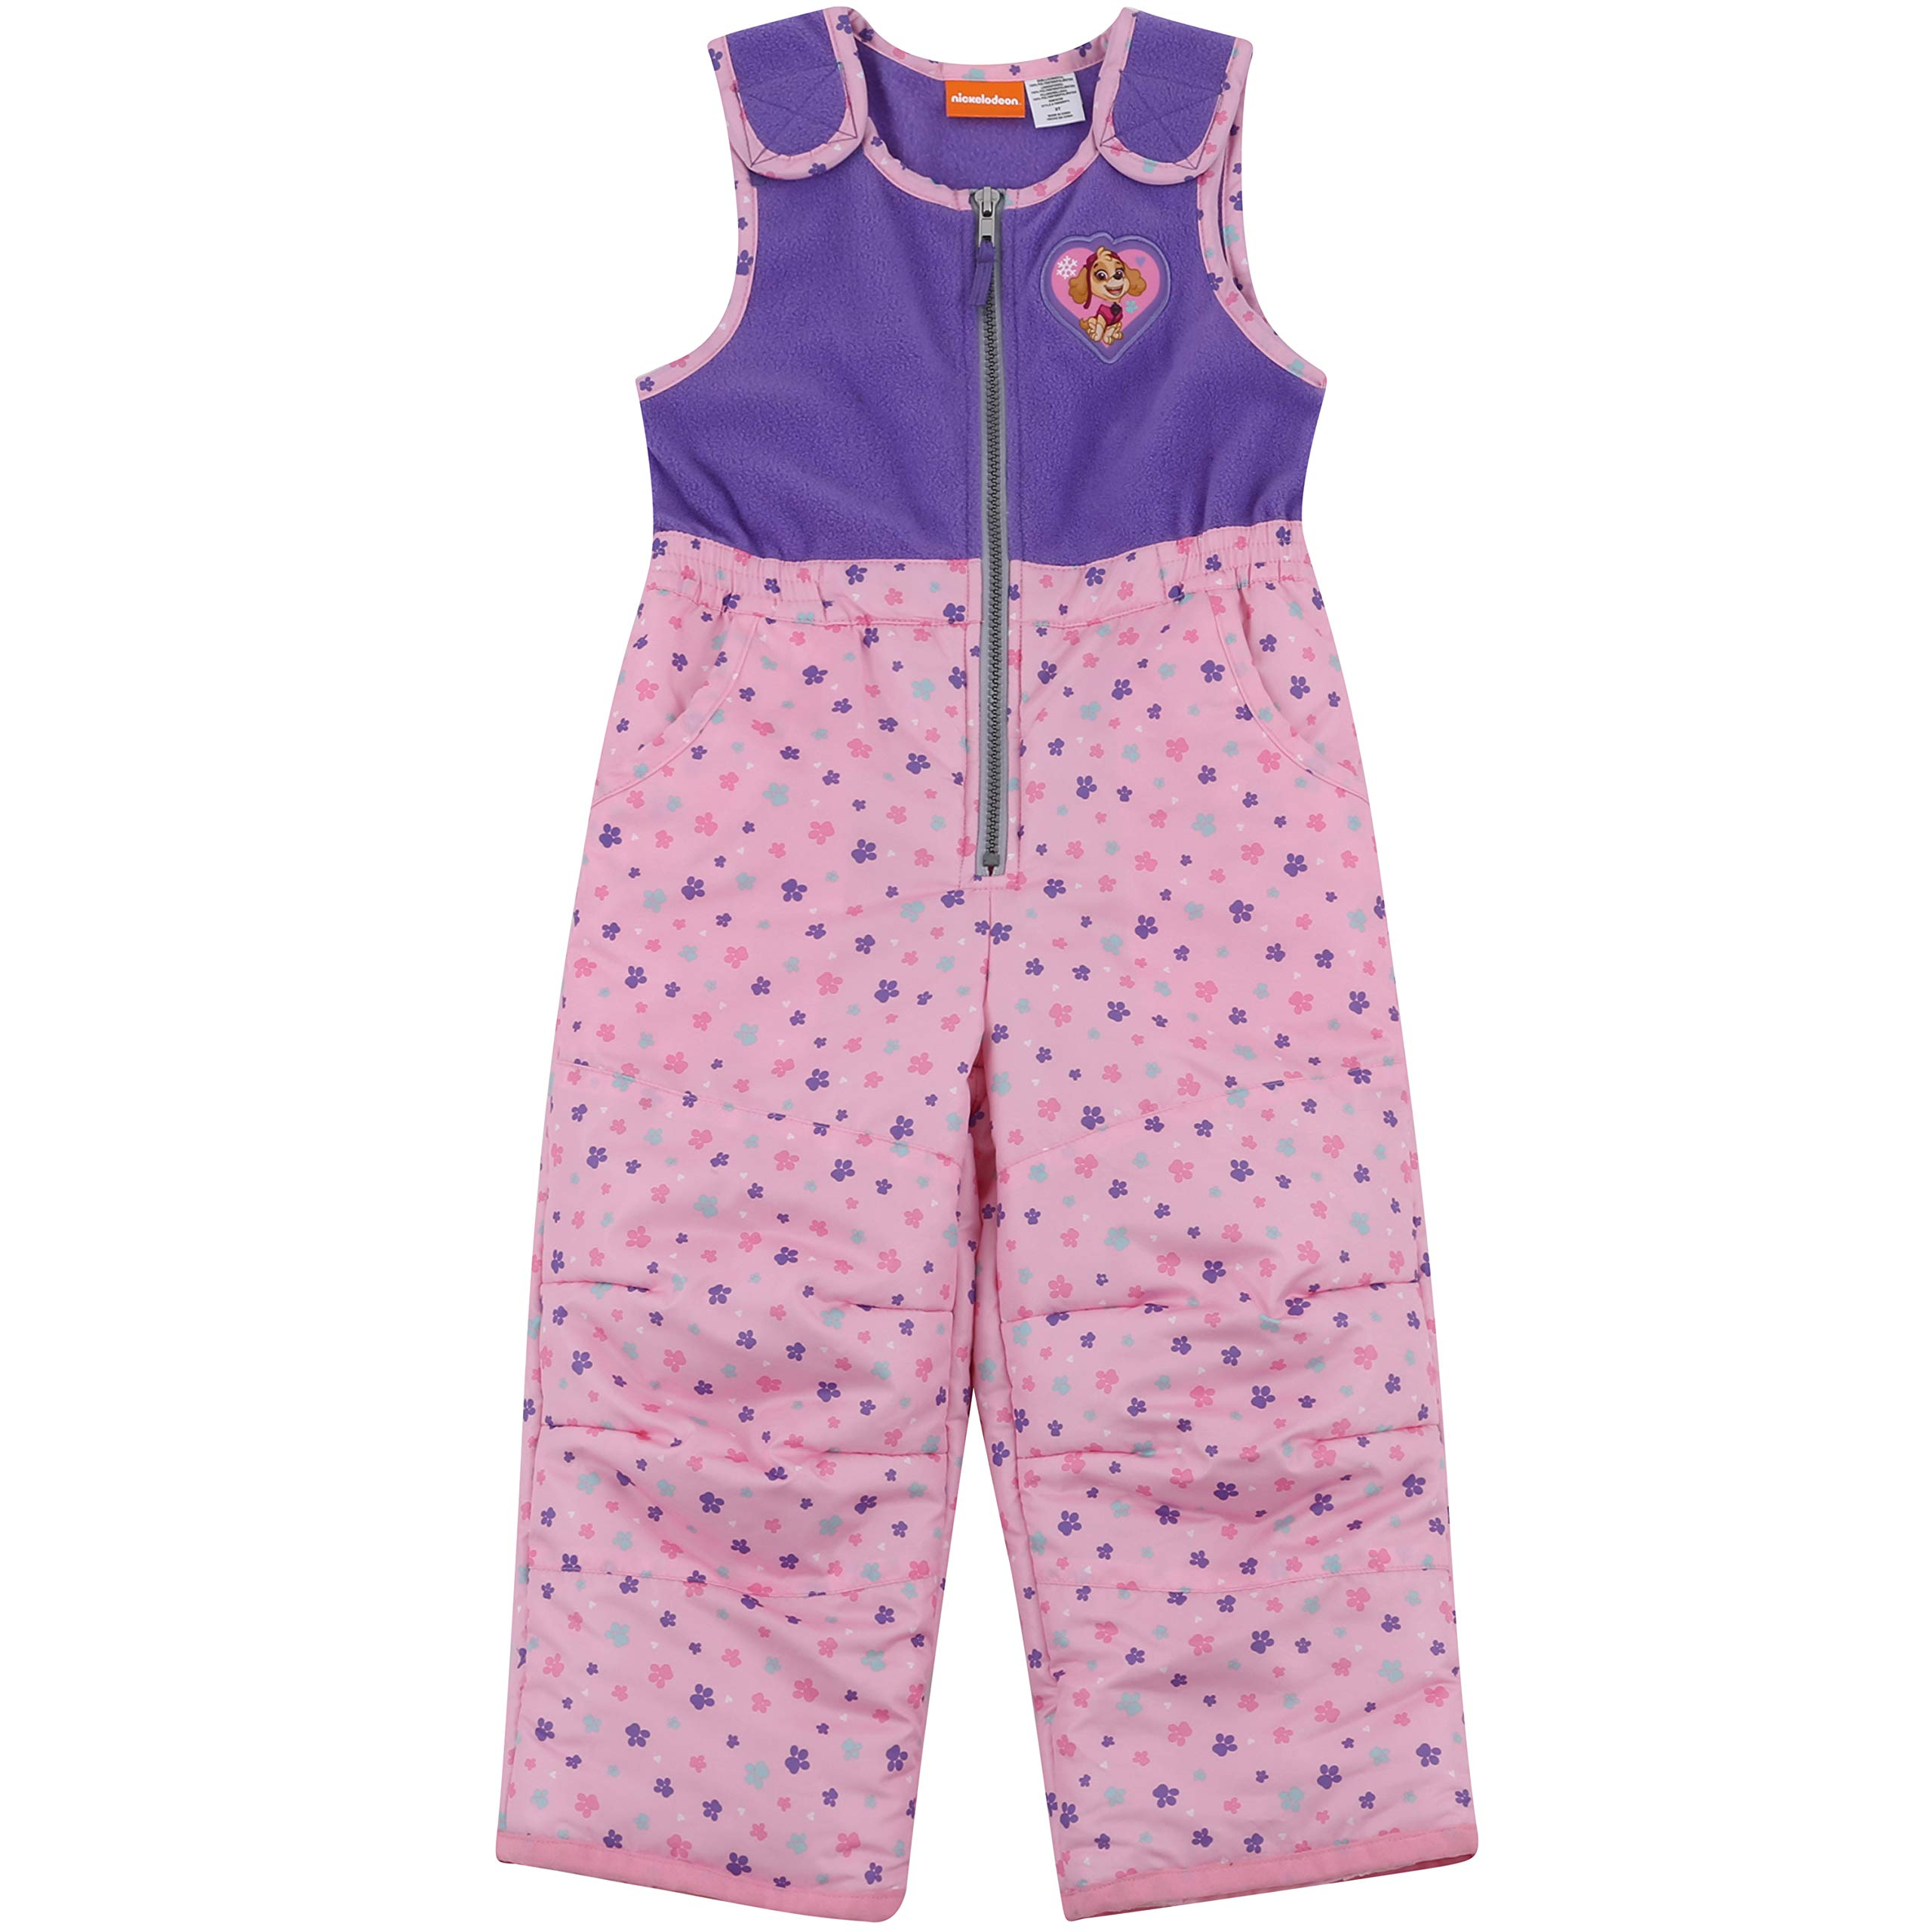 Girls' Paw Patrol Warm Winter Ski Suit Bib Jacket Coat 4 by Dreamwave